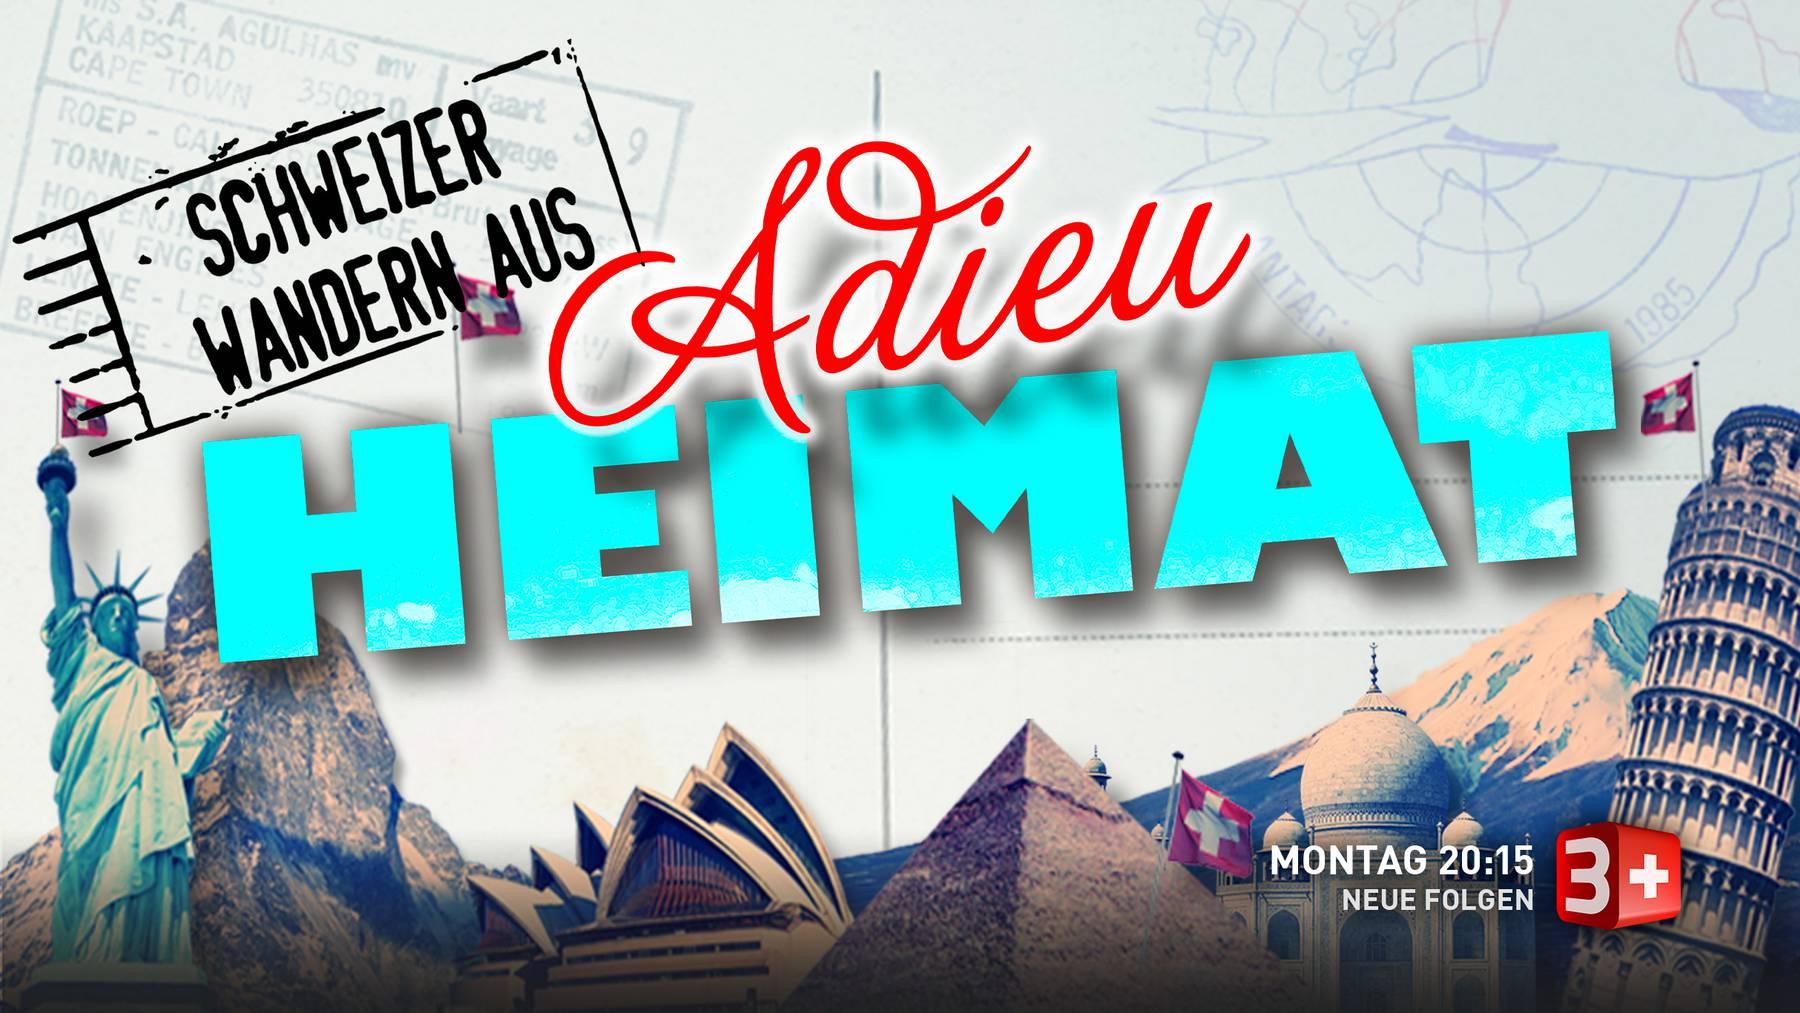 Adieu Heimat - Schweizer wandern aus